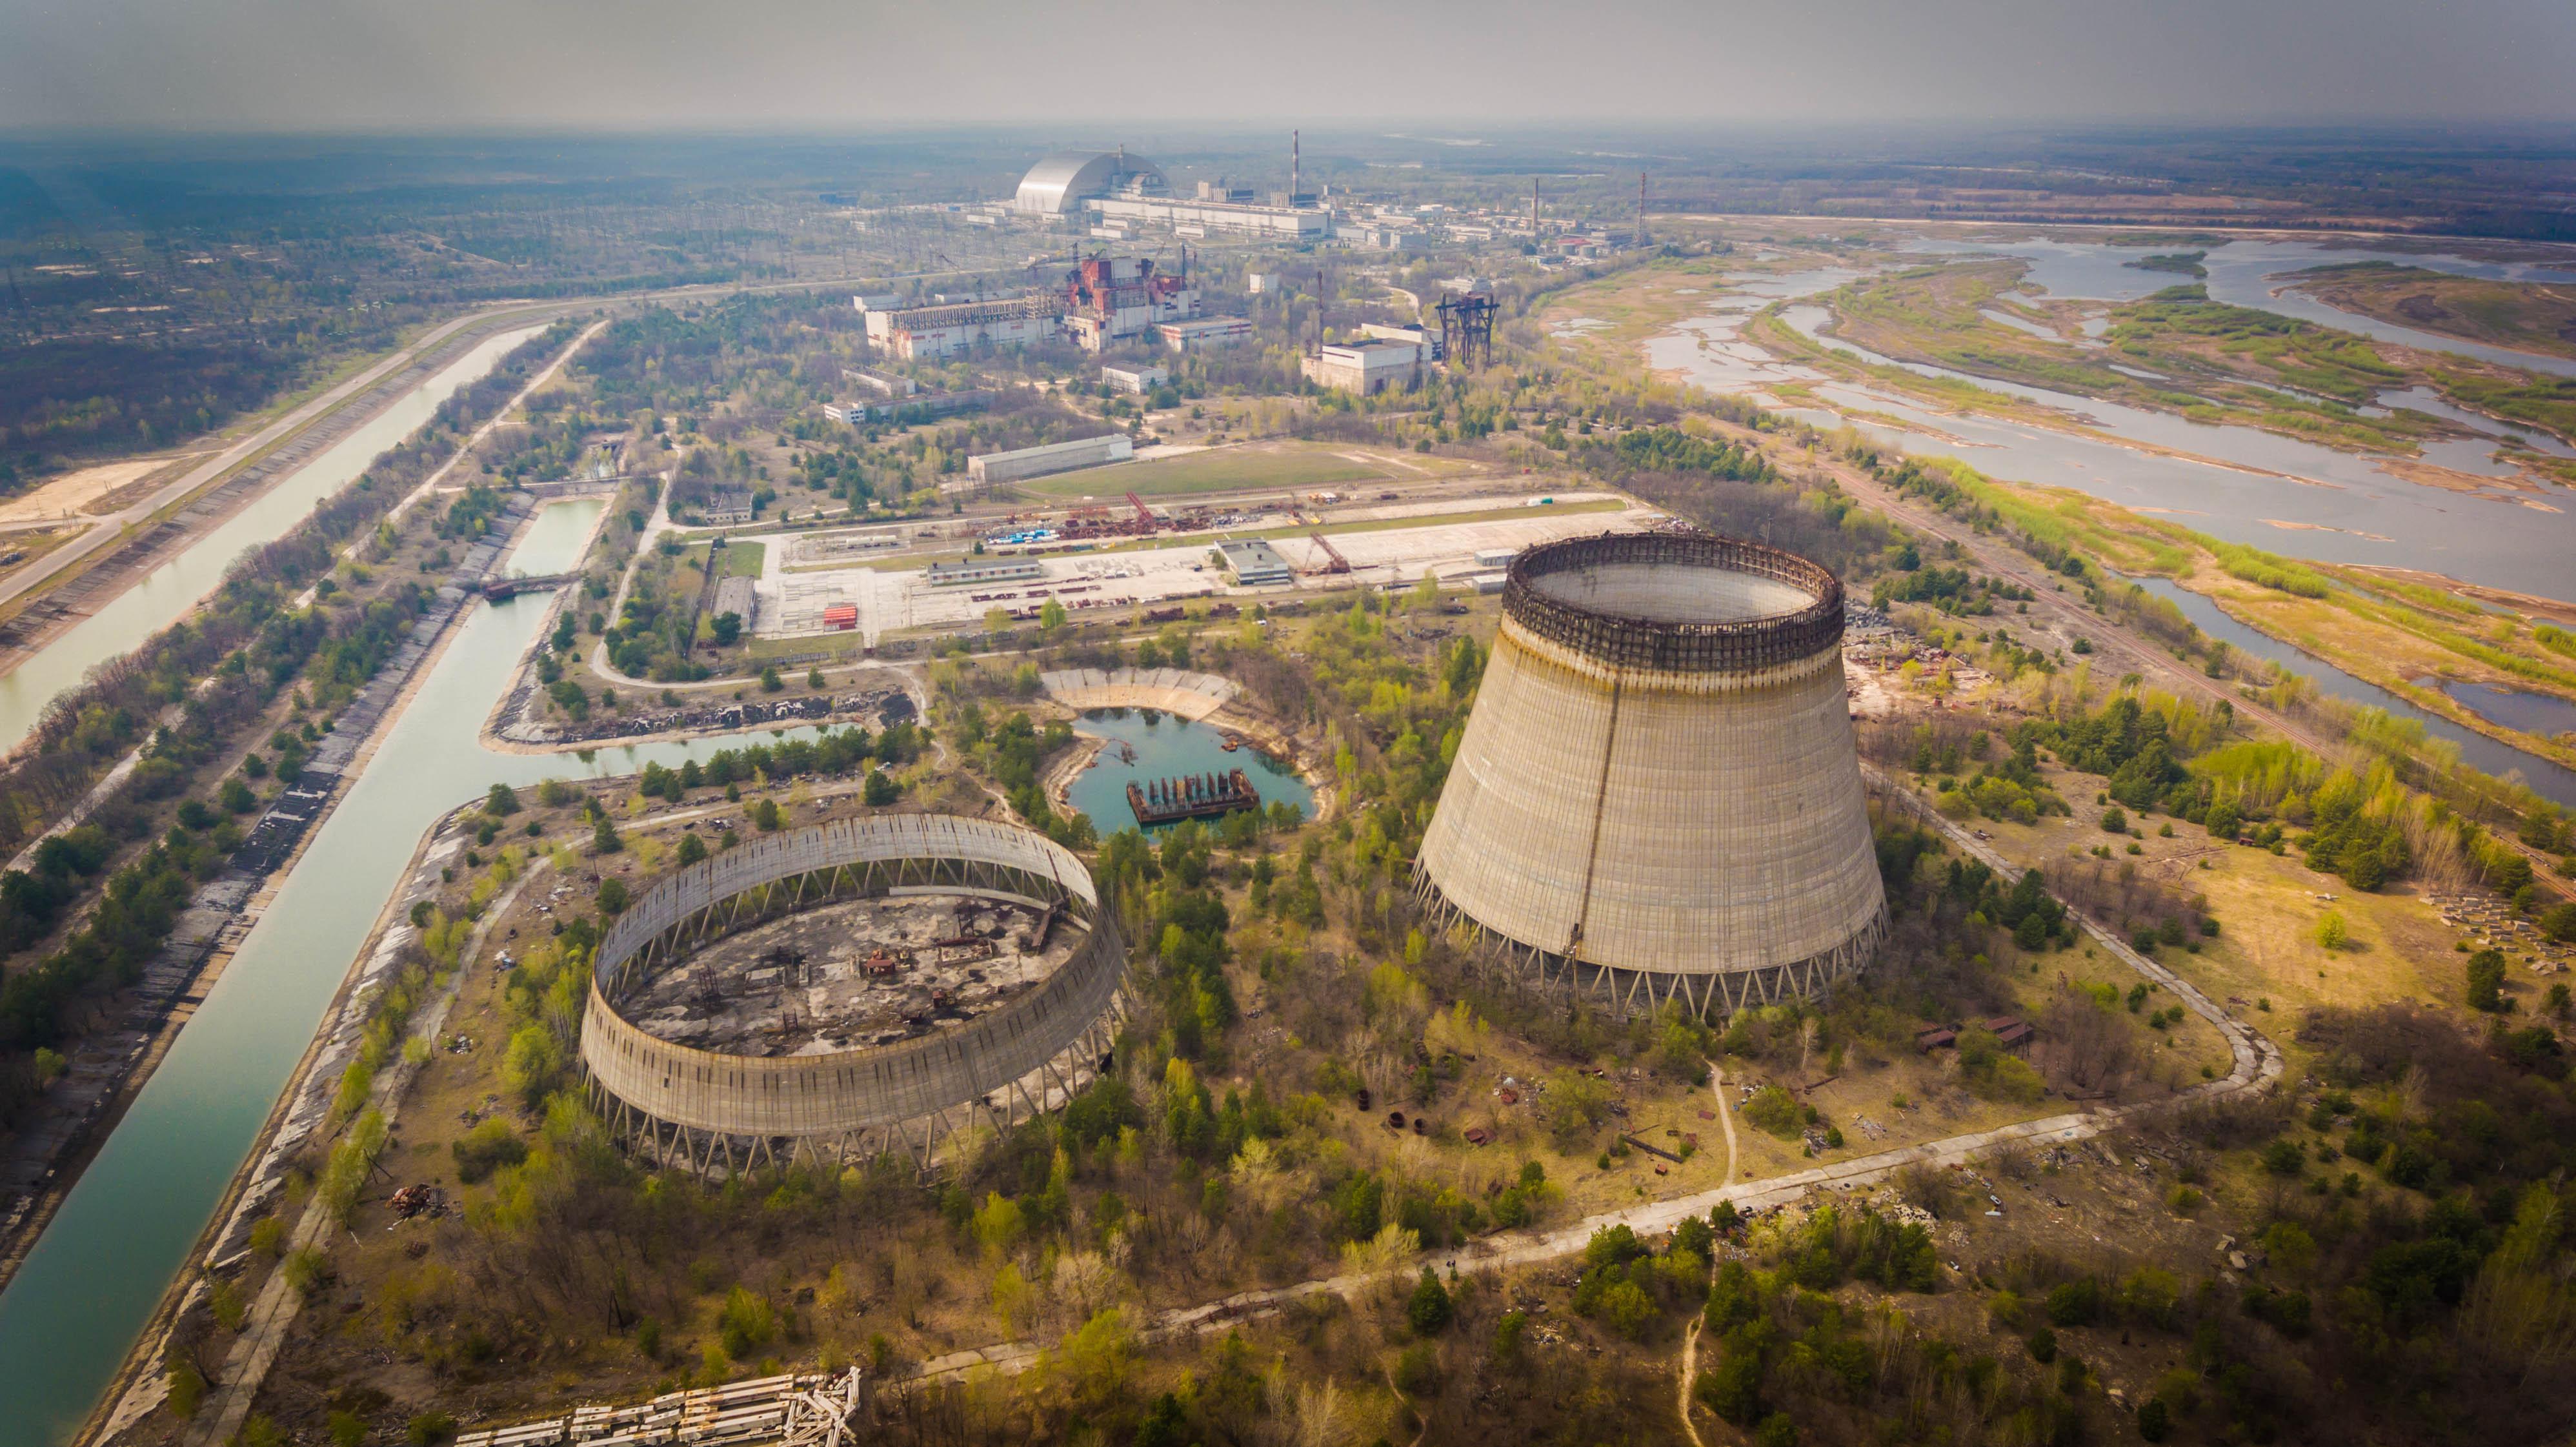 Chernobyl's liquidators didn't cross on radiation harm to their youngsters pyuMw27rKxuEuS5A26UsAj